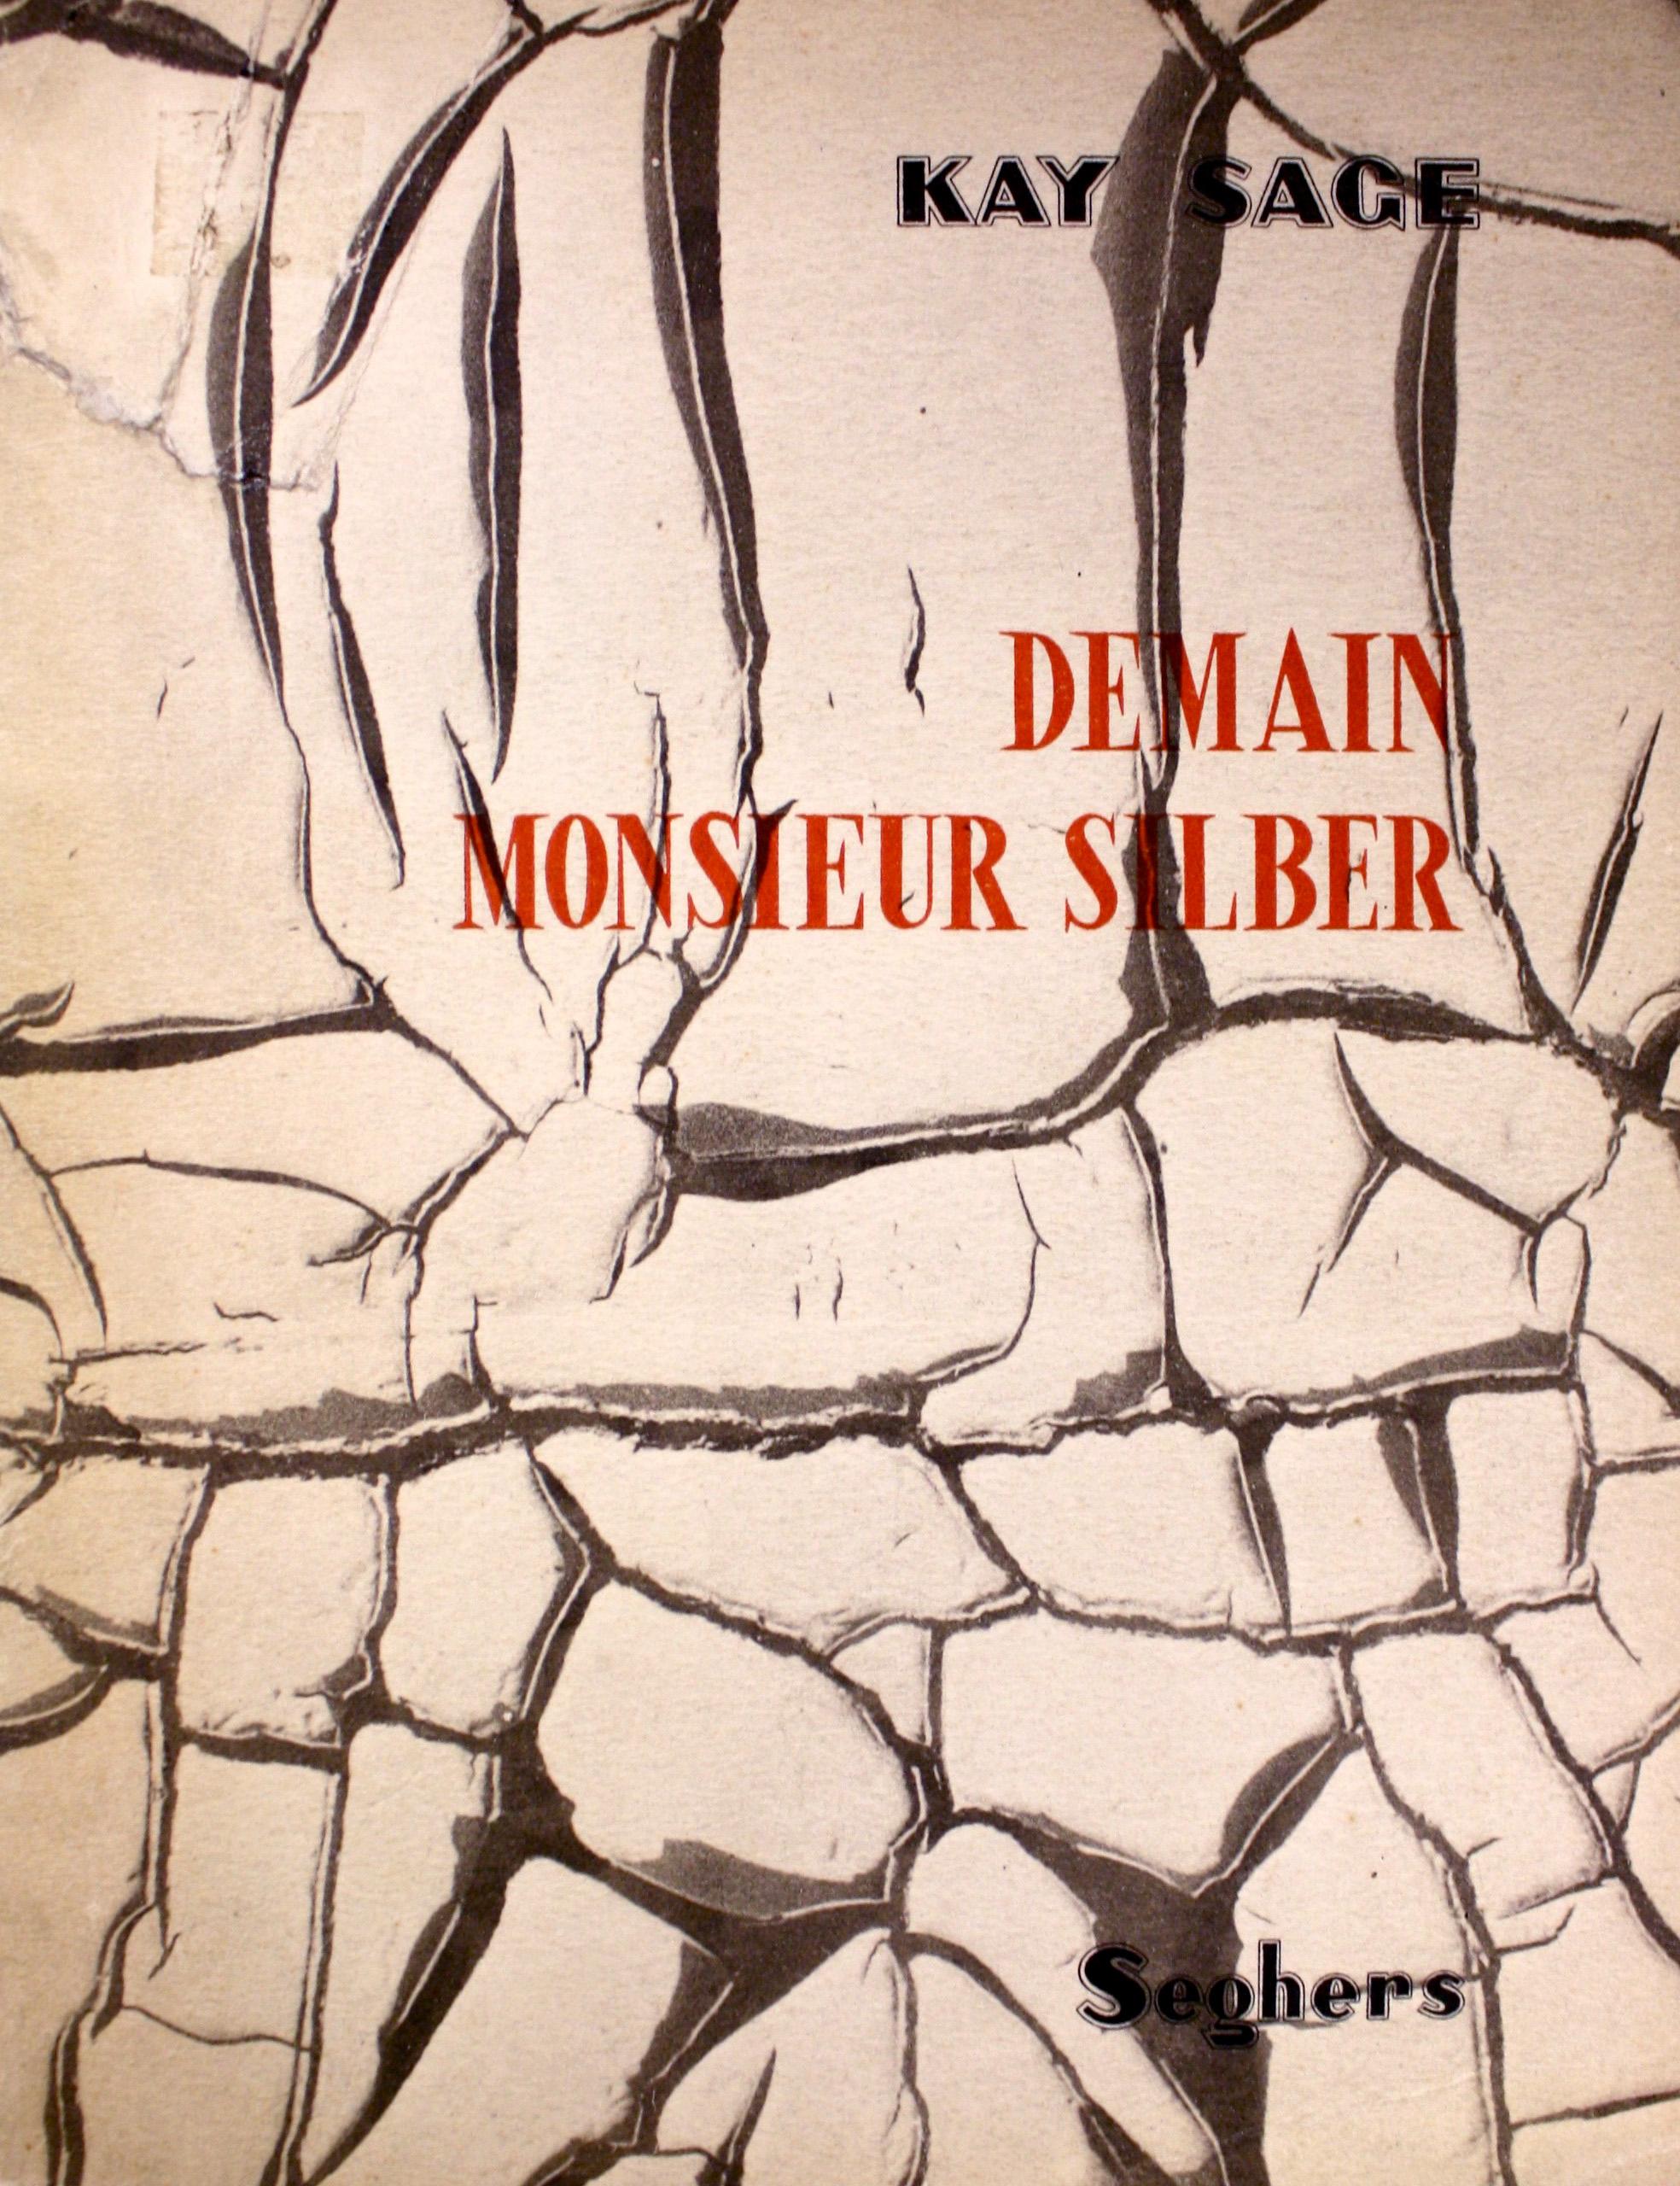 Kay Sage, <br /><em>Demain MonsieurSilber</em>, 1957